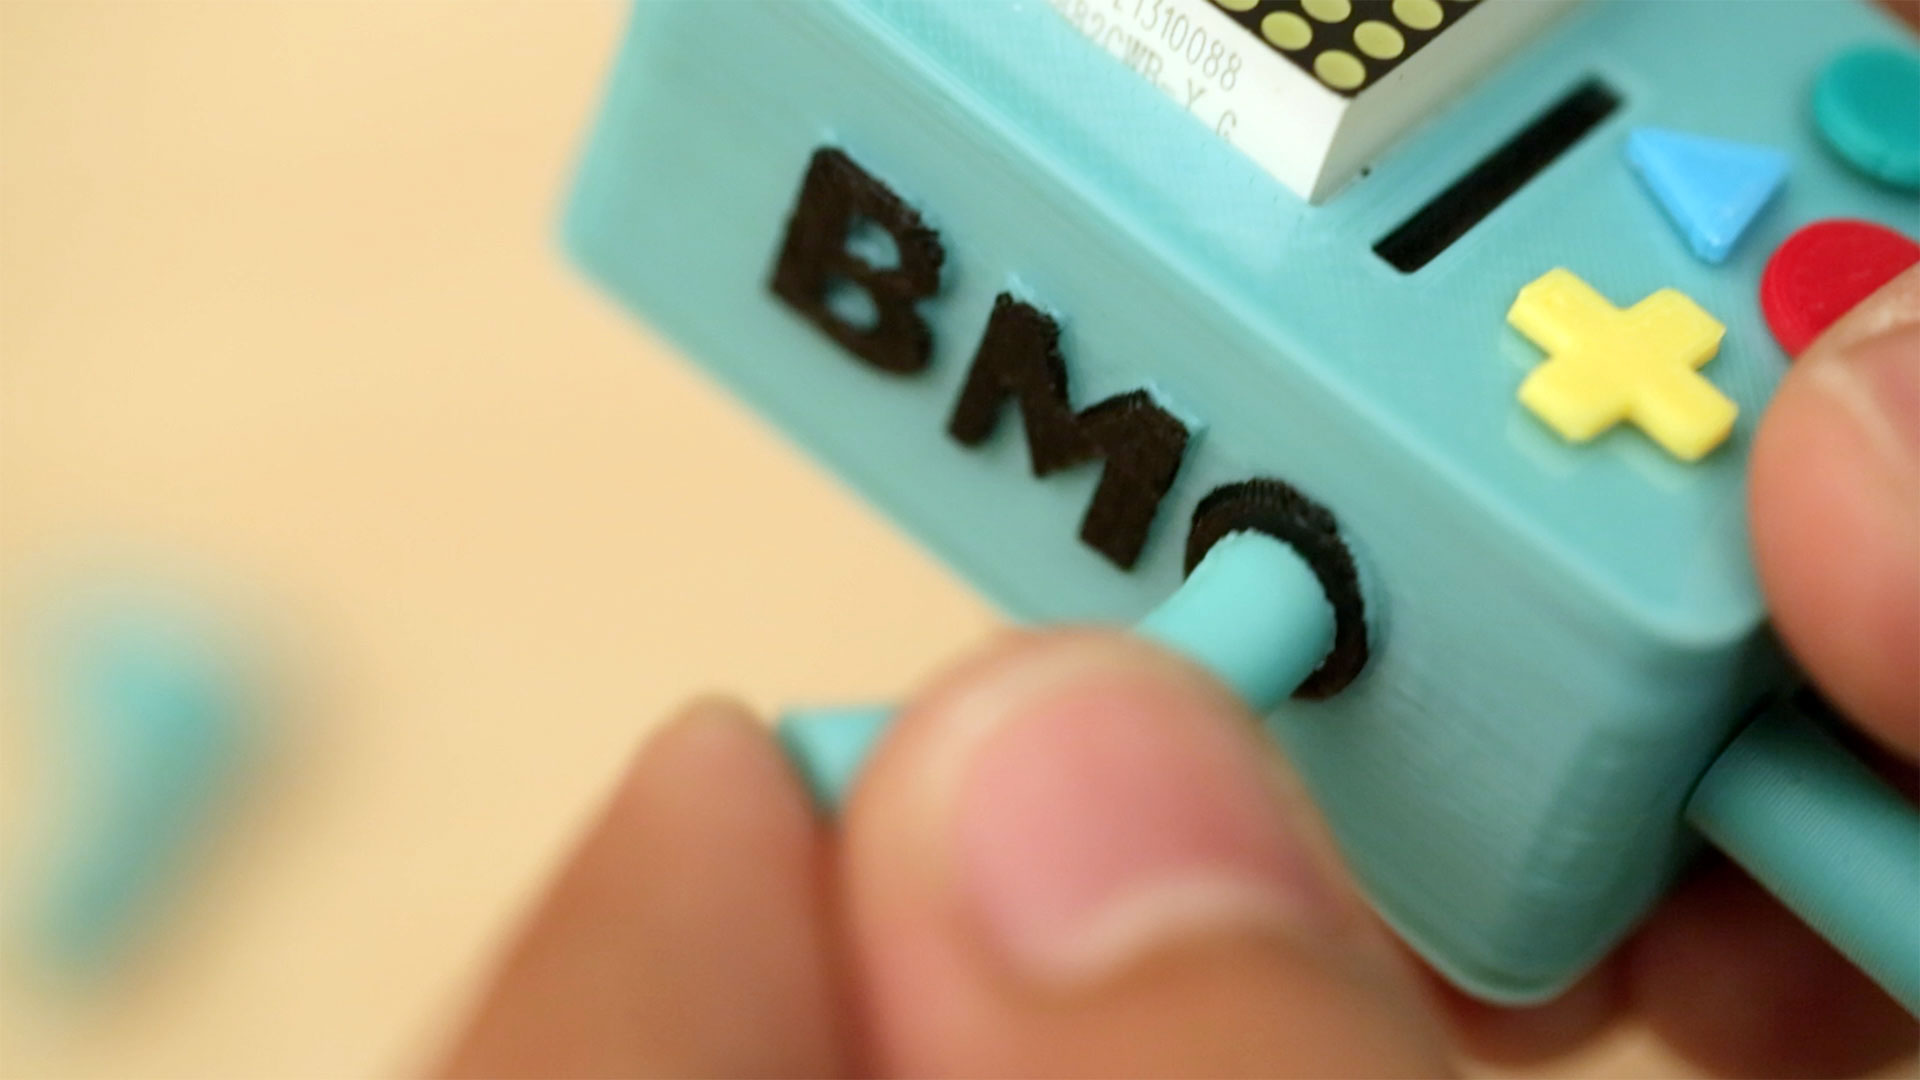 3d_printing_bmo-limbs.jpg